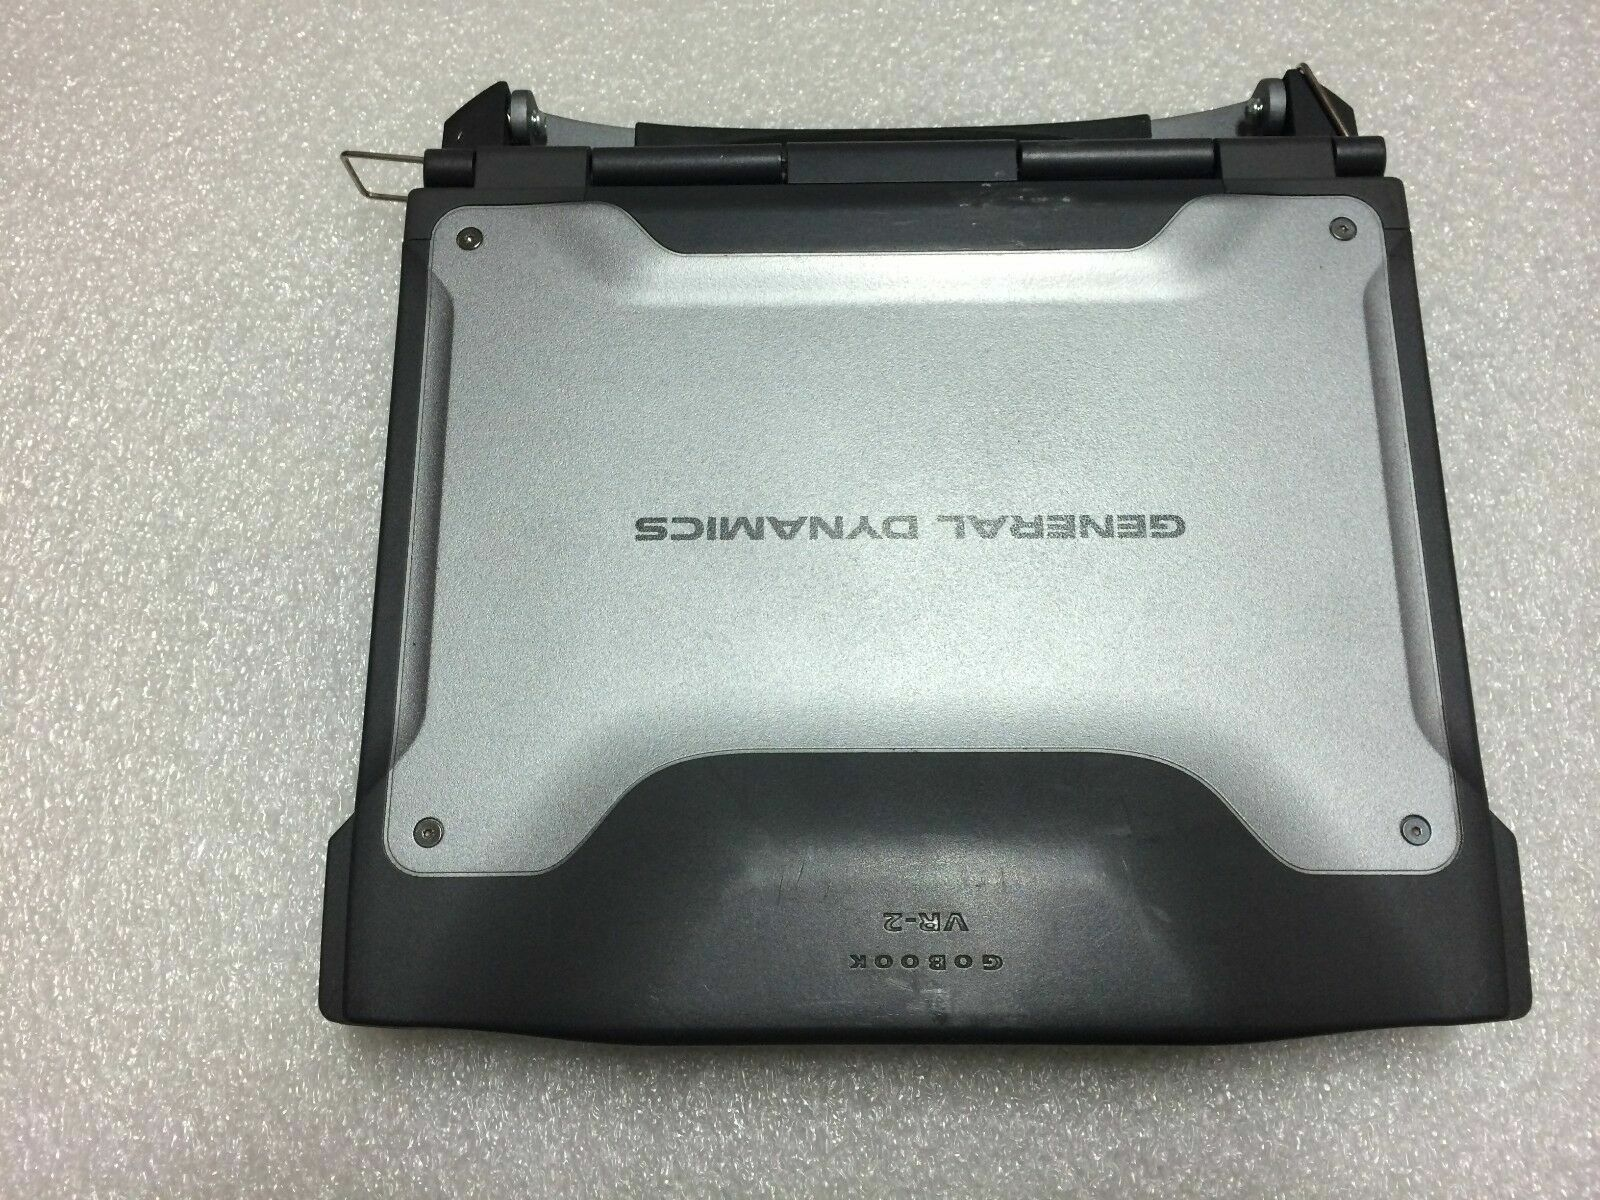 ITRONIX VR-2 3GB 2.0GHZ TOUGHBOOK LAPTOP 640GB DVDR-W GENERAL DYNAMICS OFFICE 07